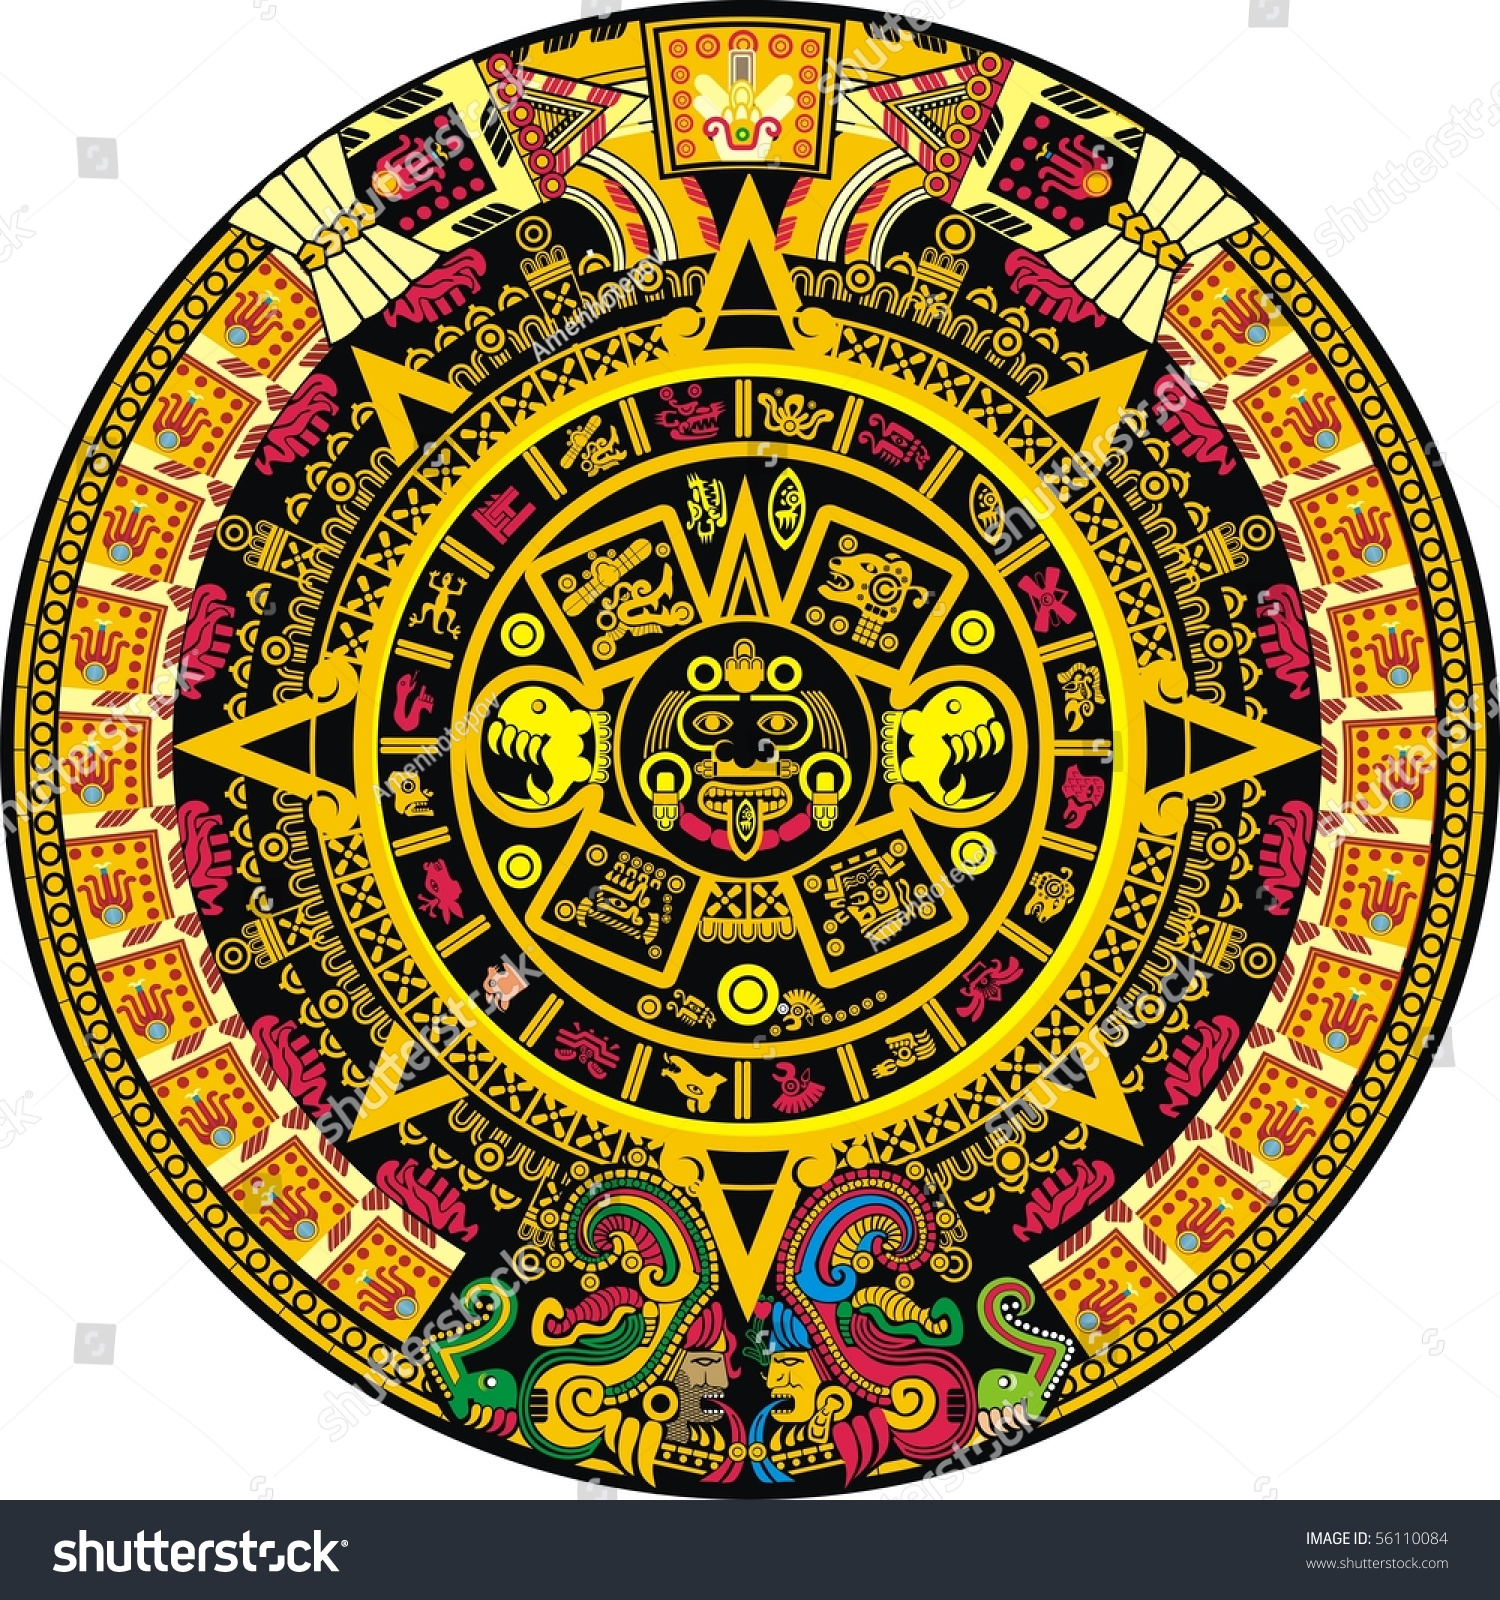 Wallpaper Editorial Calendar : Aztec calendar color stock vector shutterstock